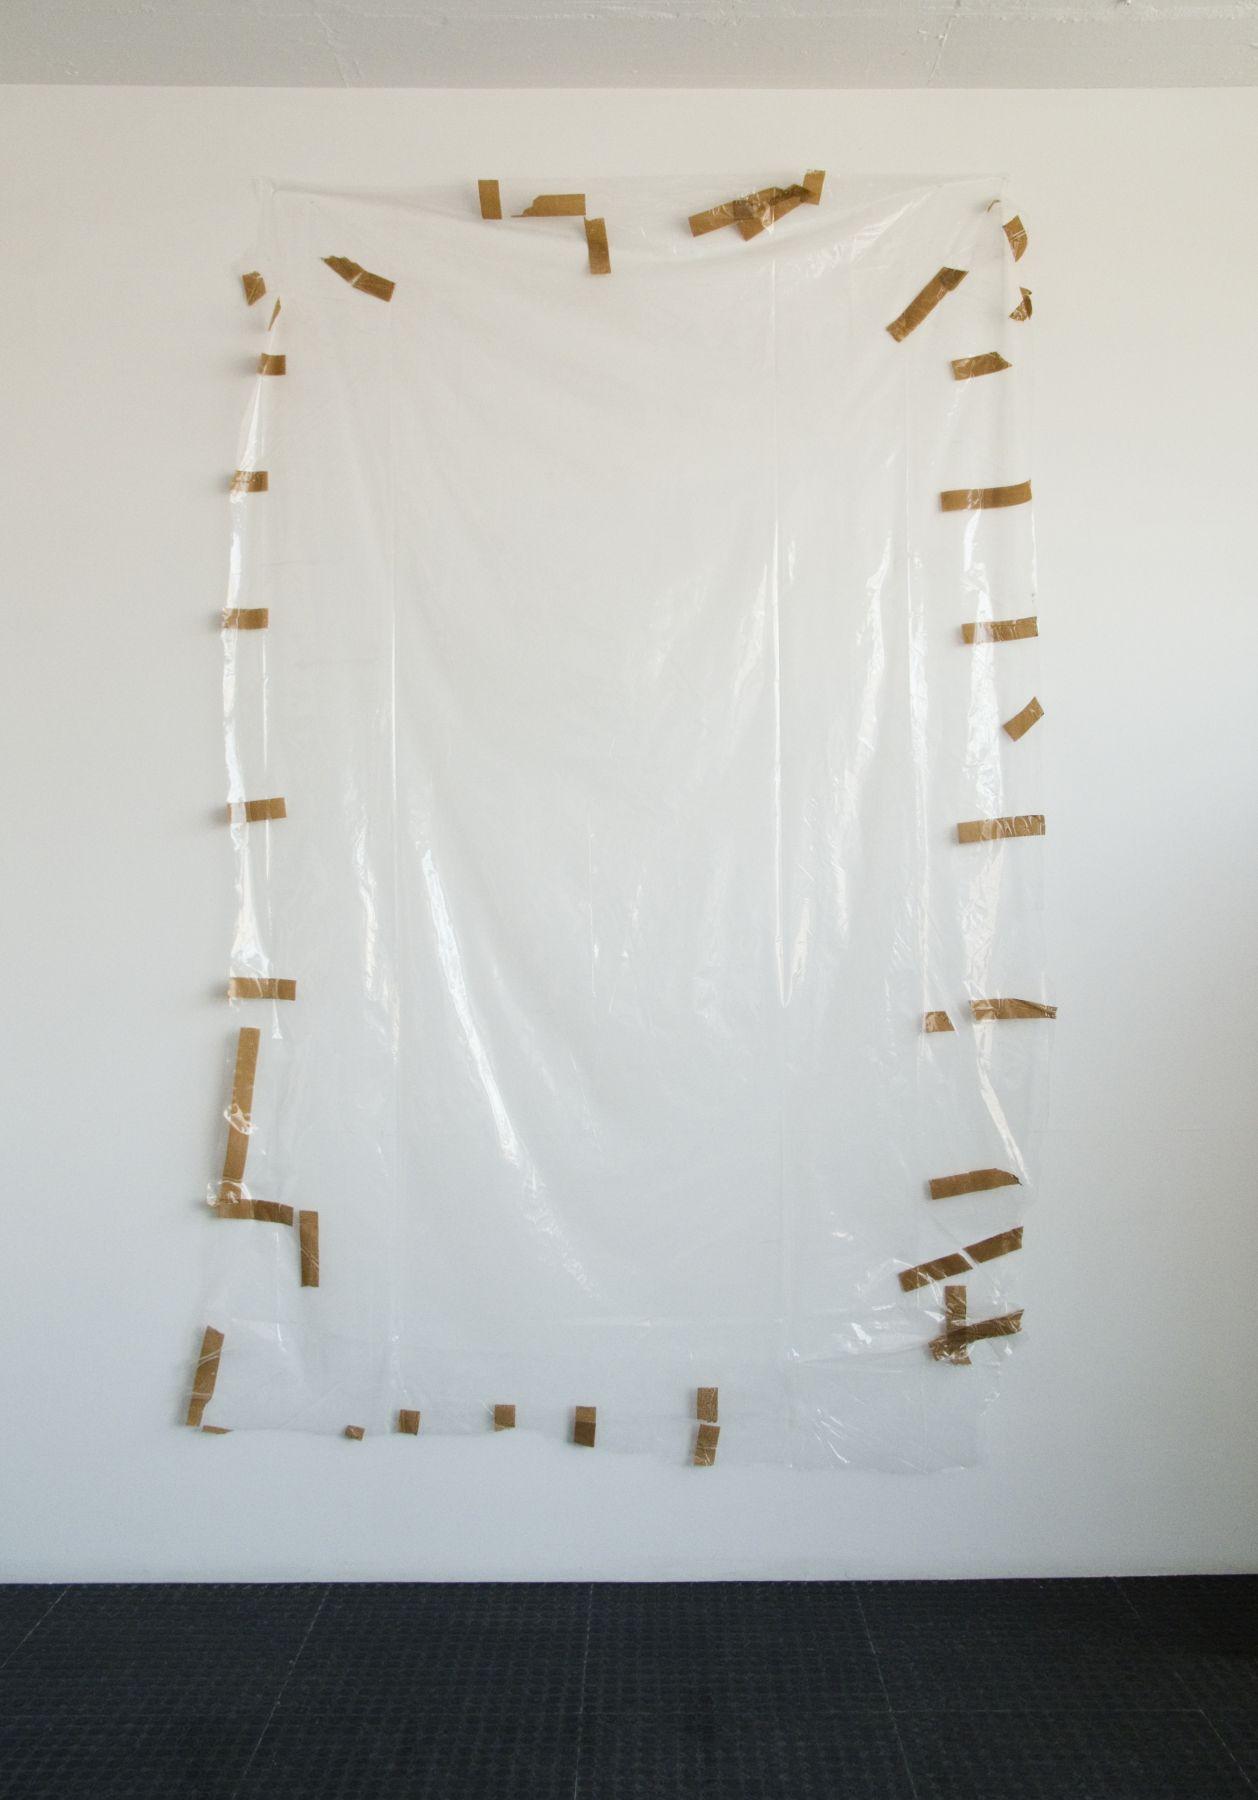 Gedi Sibony If, 2008 Plastic, tape 115 x 77 inches 292.1 x 195.58 cm